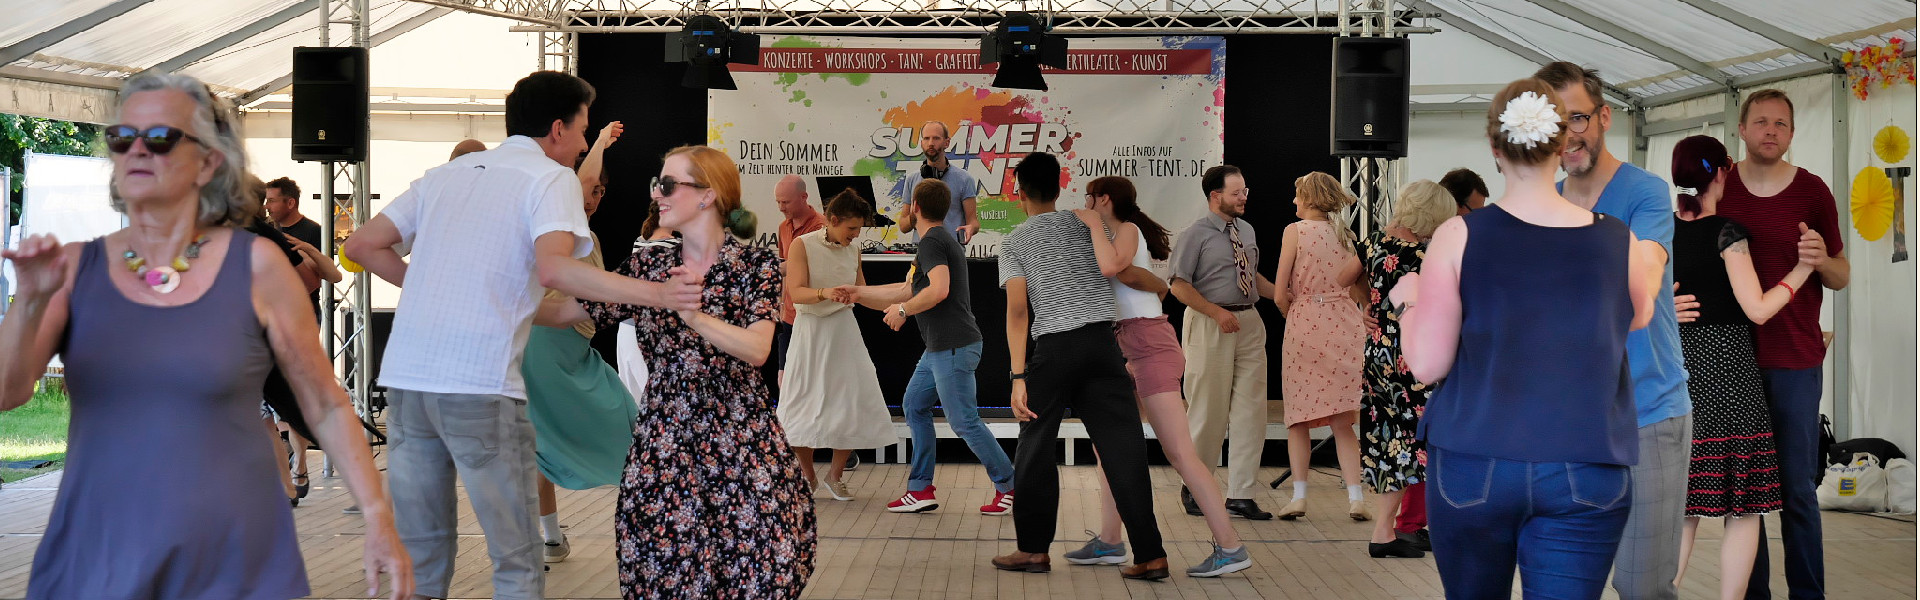 SummerTent-JKJ2021-Jugendkultursommer-FullScreen-LindyHop